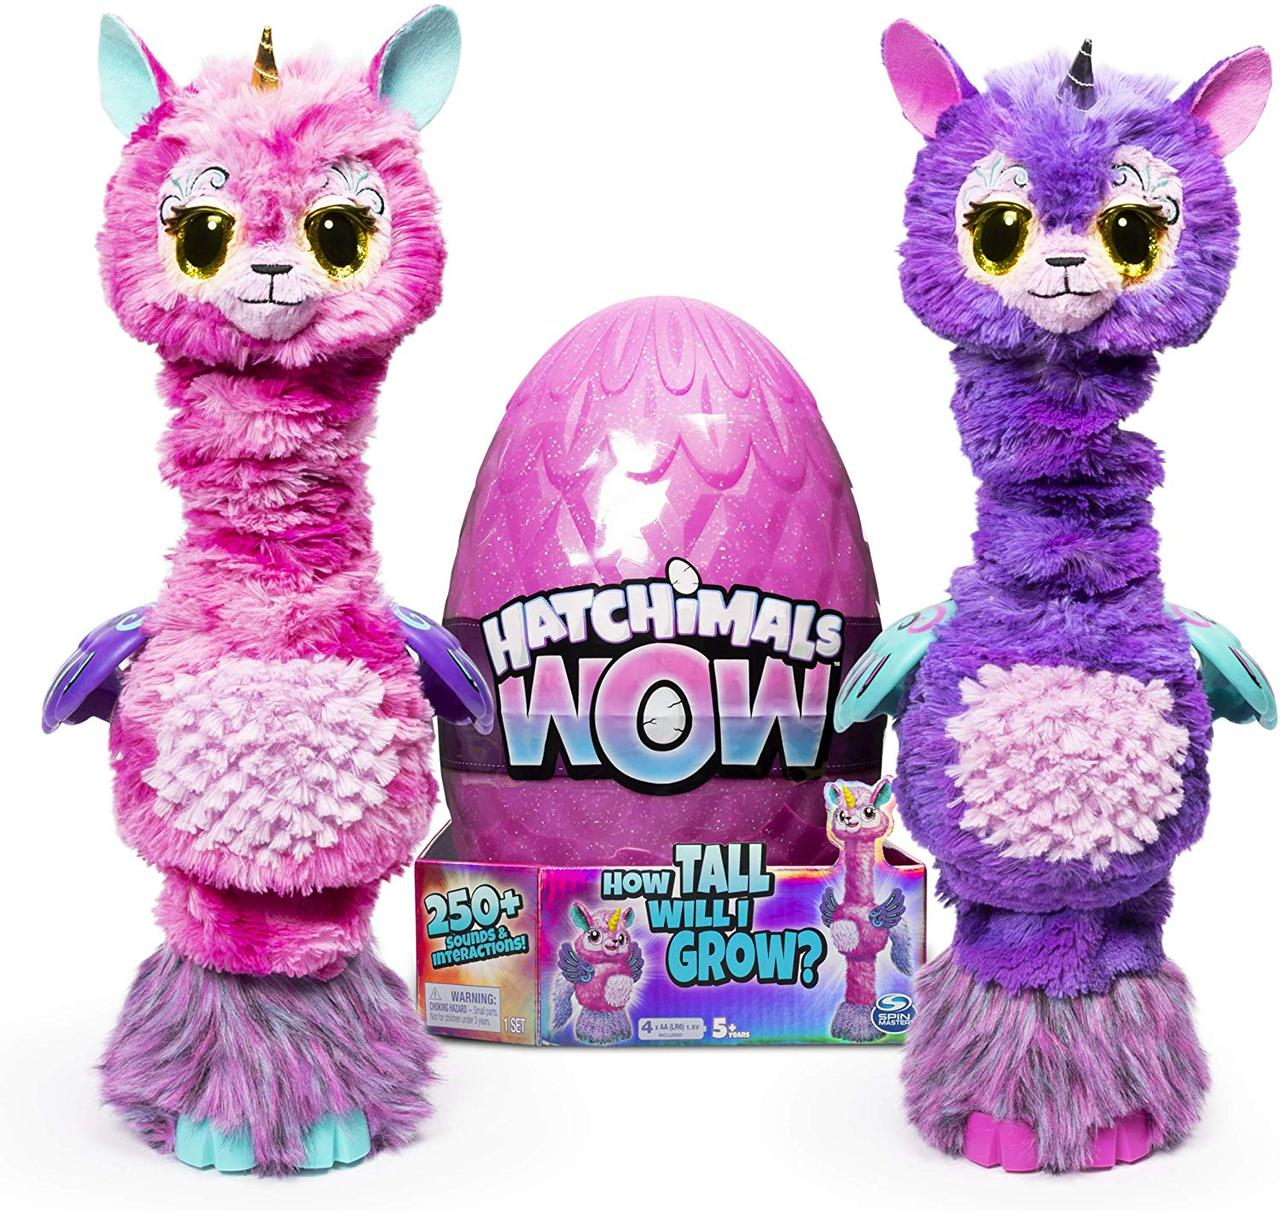 "Интерактивное яйцо Хетчималс Ламарог 81 см Единорог Лама Hatchimals Wow Llalacorn 32"" Tall Interactive"